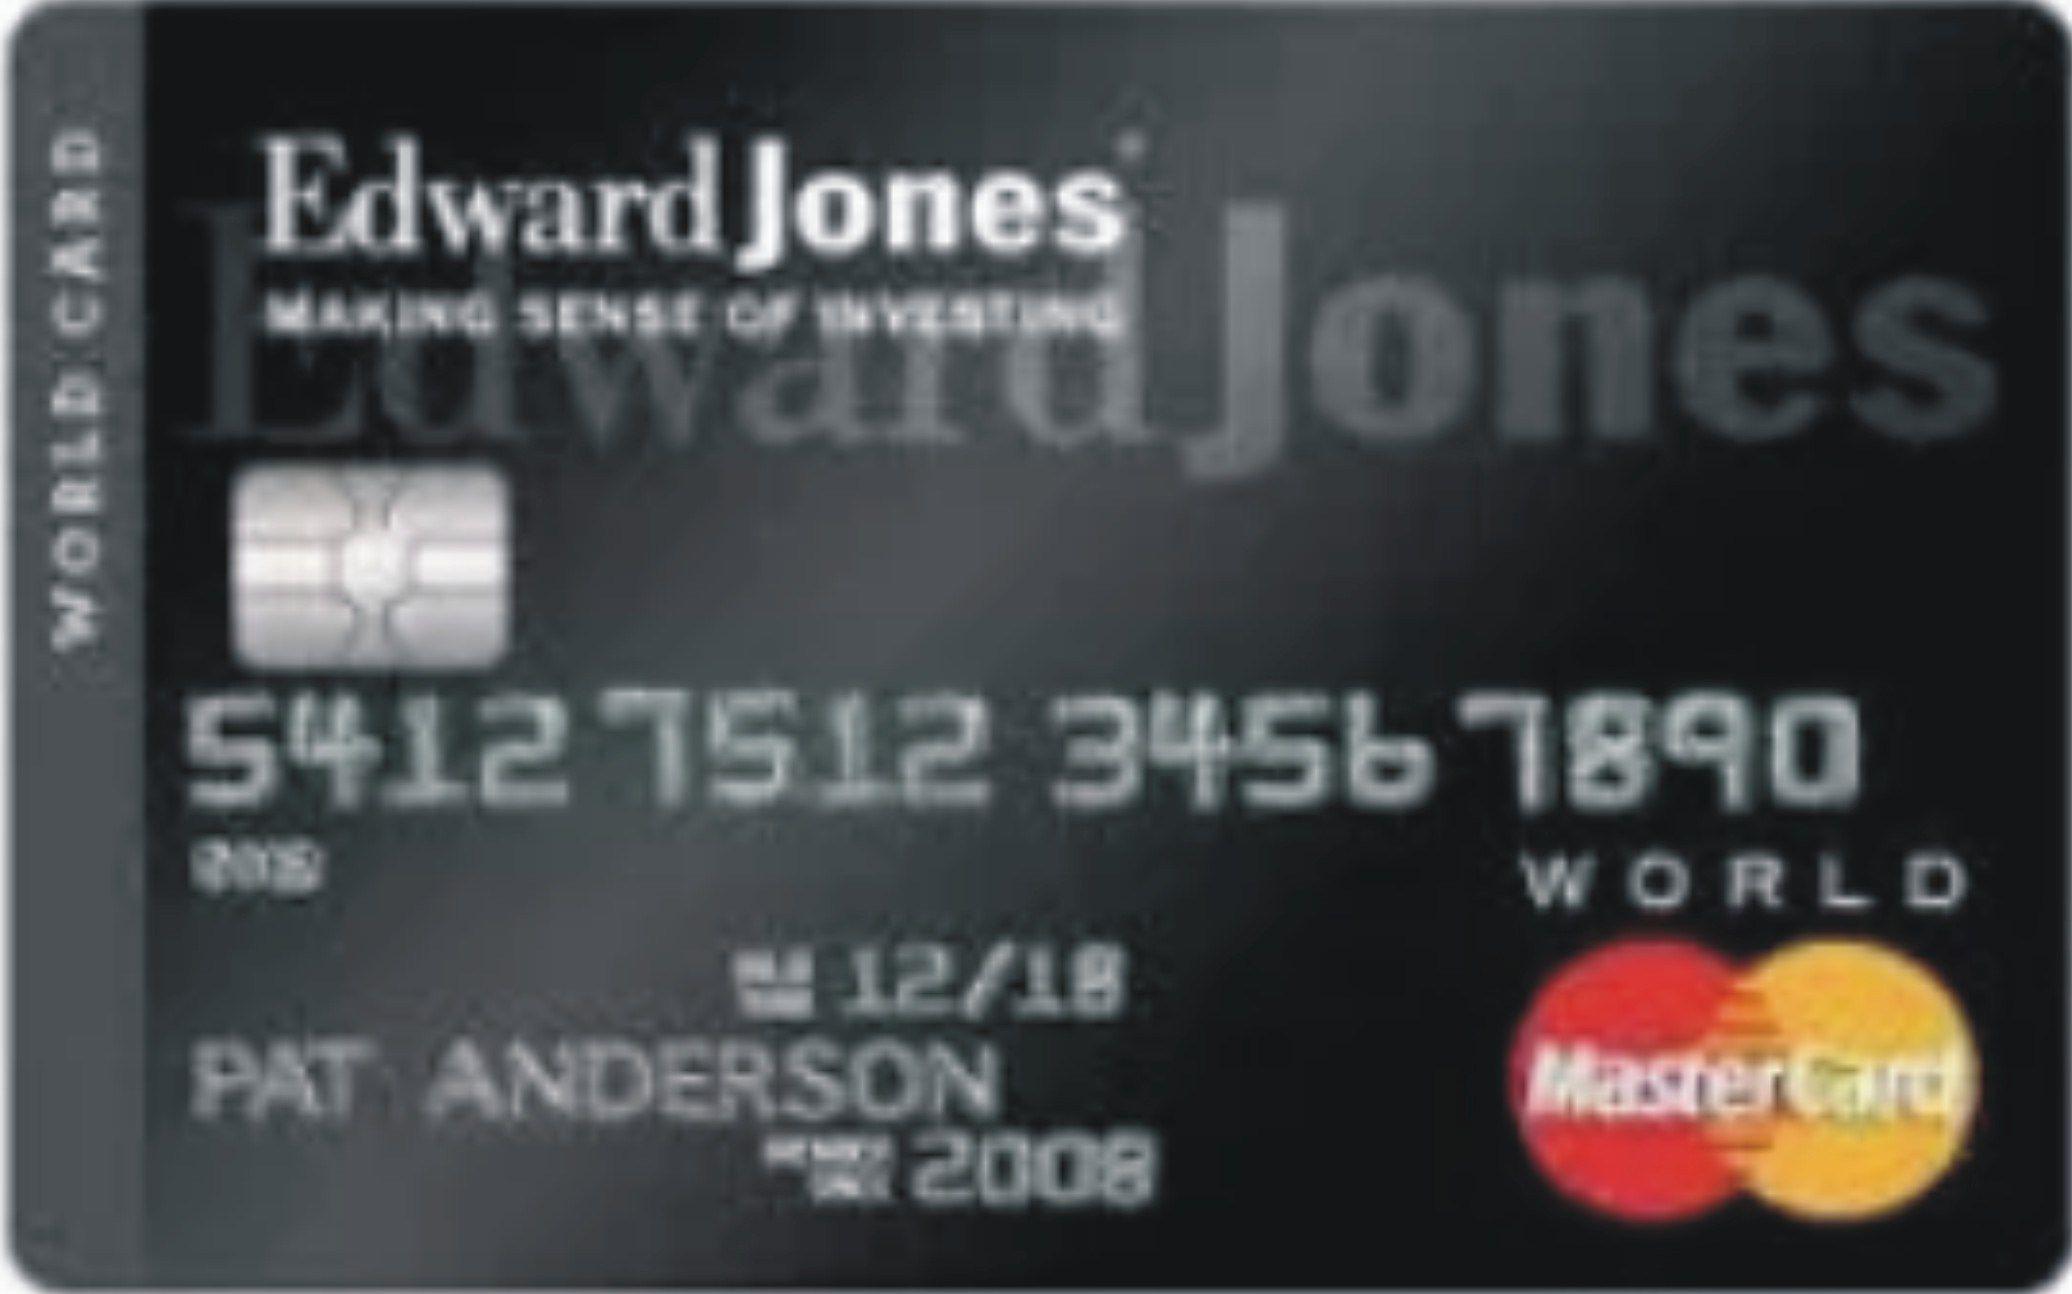 Edward Jones Secured Credit Card Catalog Mastercard Review Credit Card Reviews Small Business Credit Cards Secure Credit Card